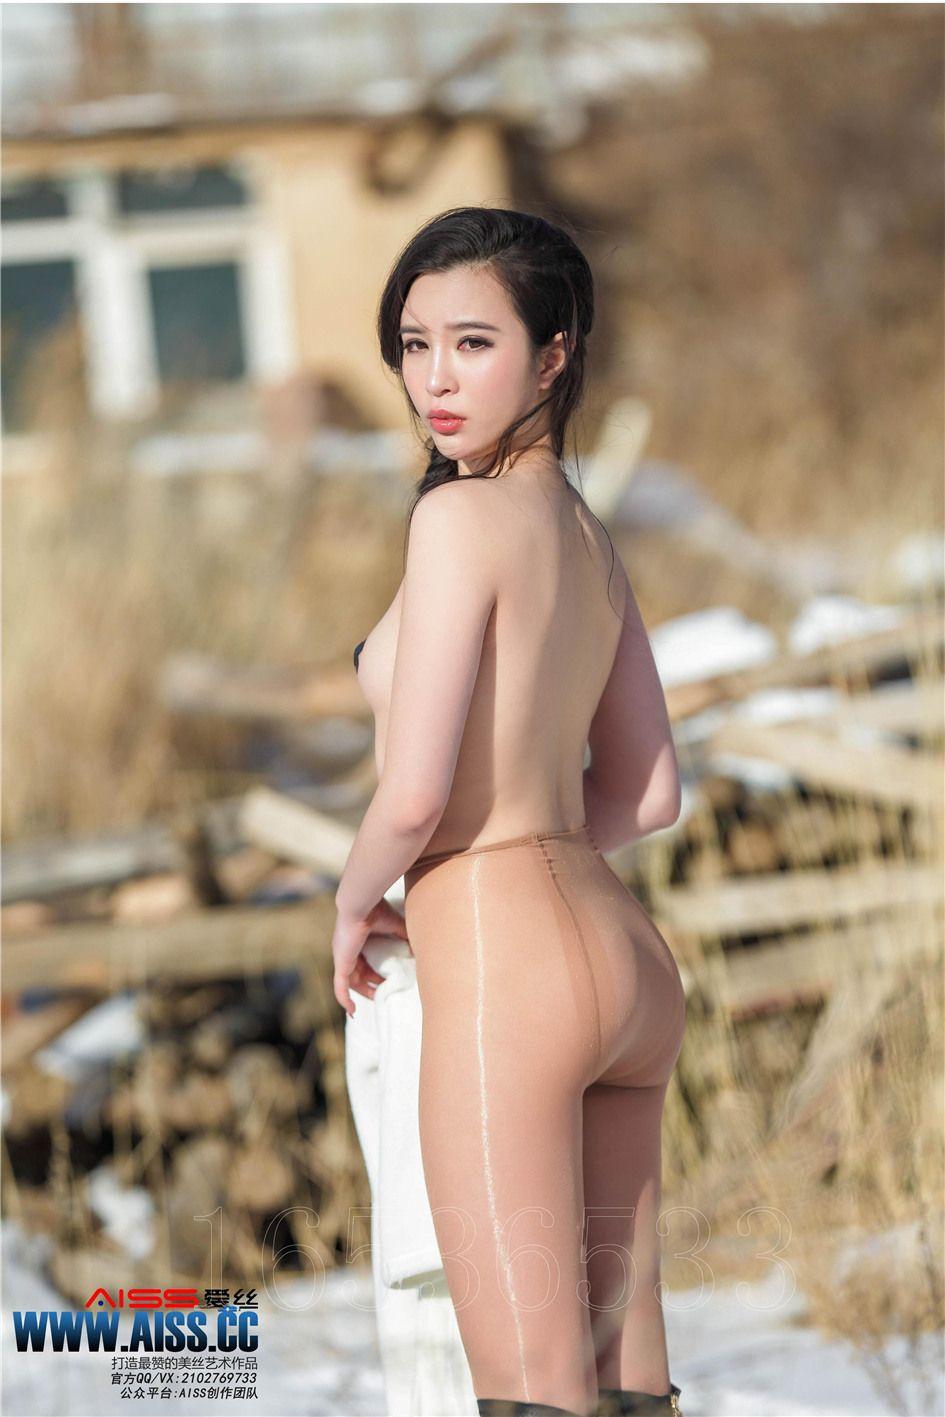 [AISS爱丝] 经典丝袜美腿外拍 第100期 冰雪女神(下